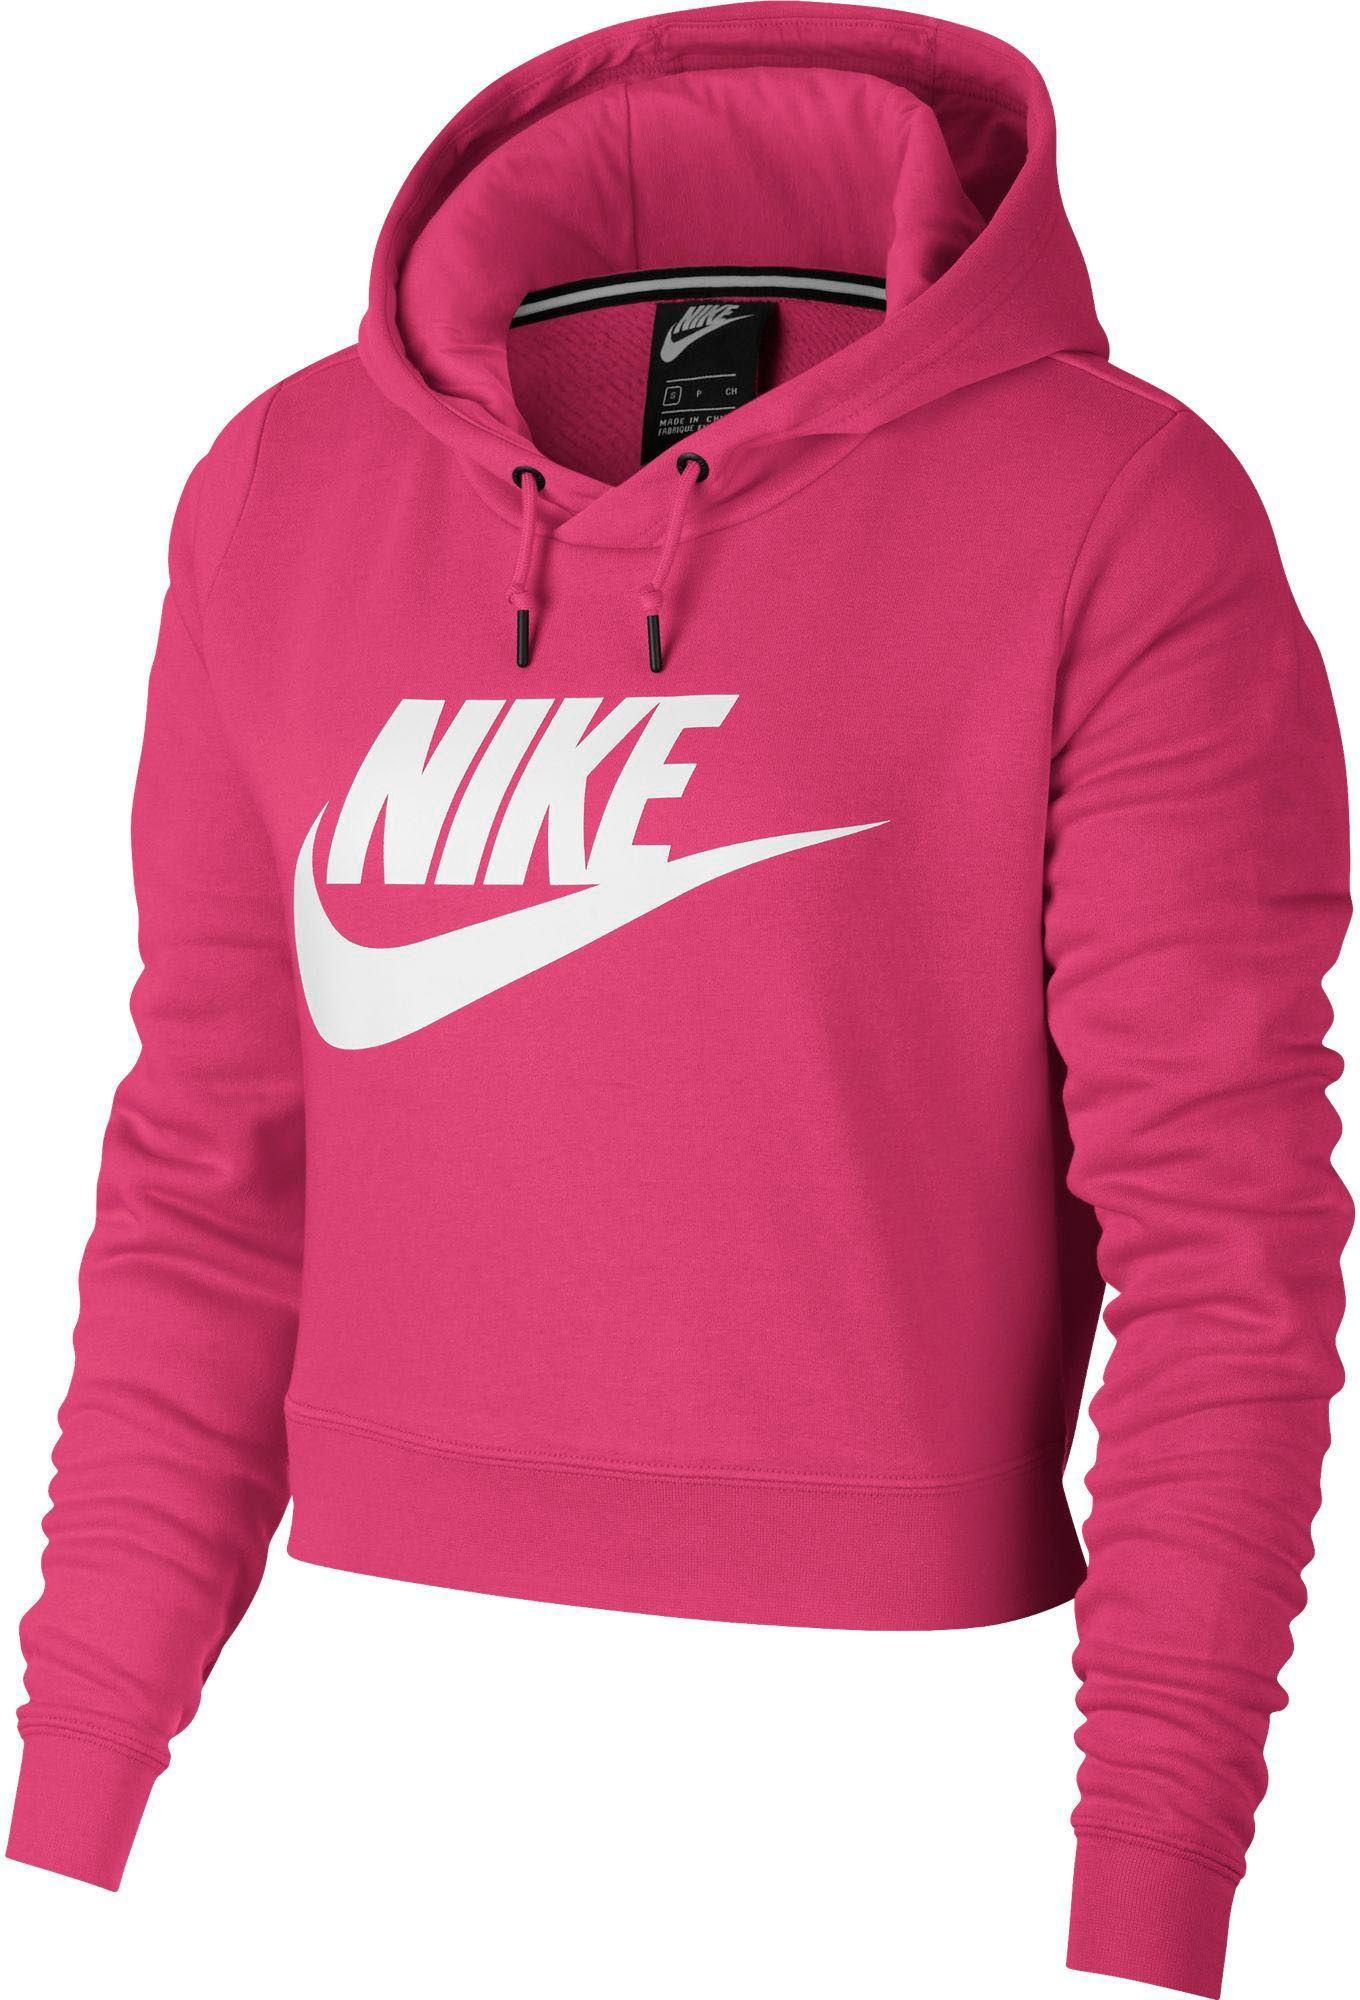 adc3ca9939388 Nike Women s Sportswear Rally Cropped Hoodie